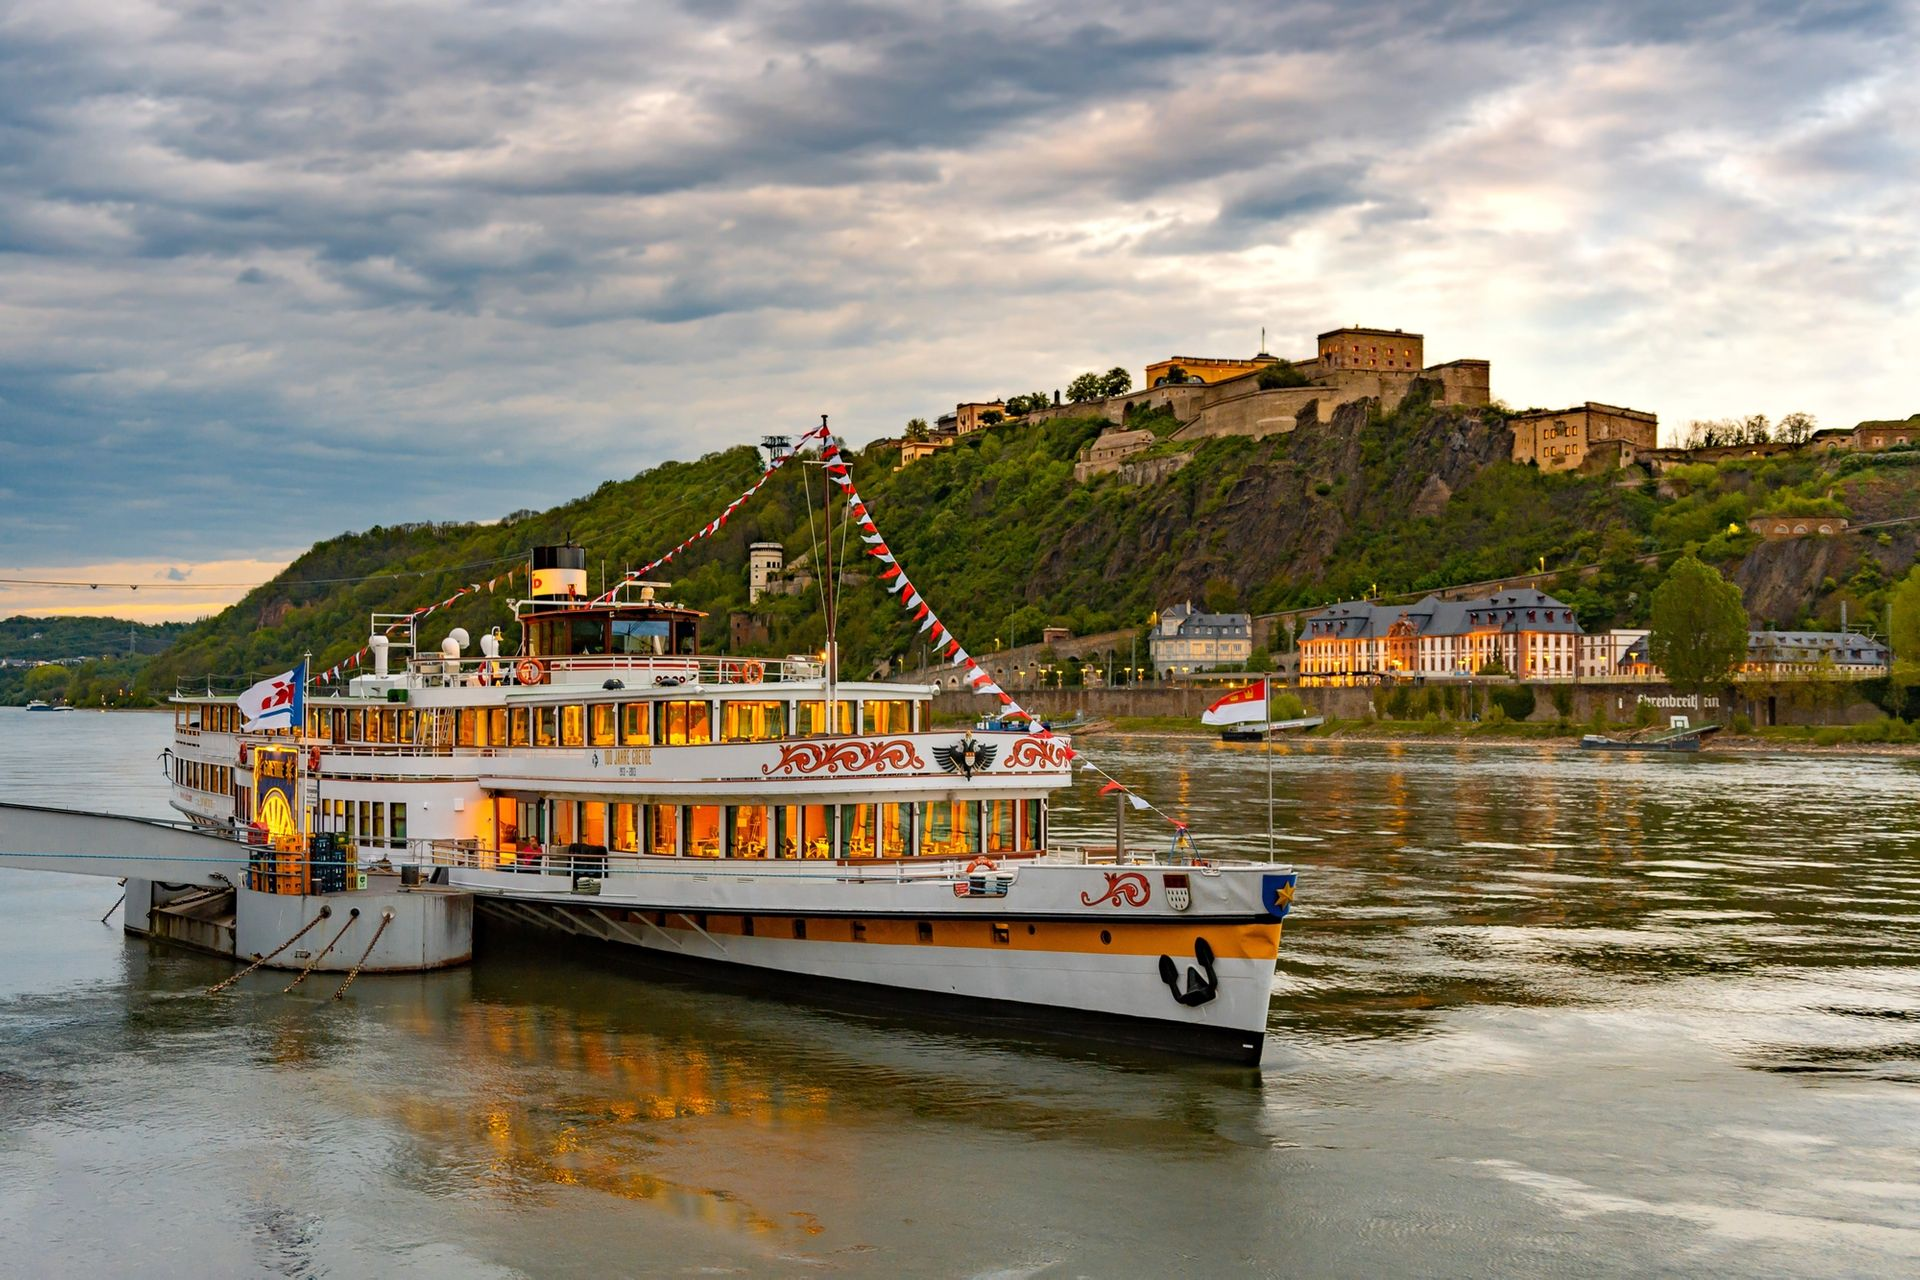 Anticimex Kammerjäger in Koblenz